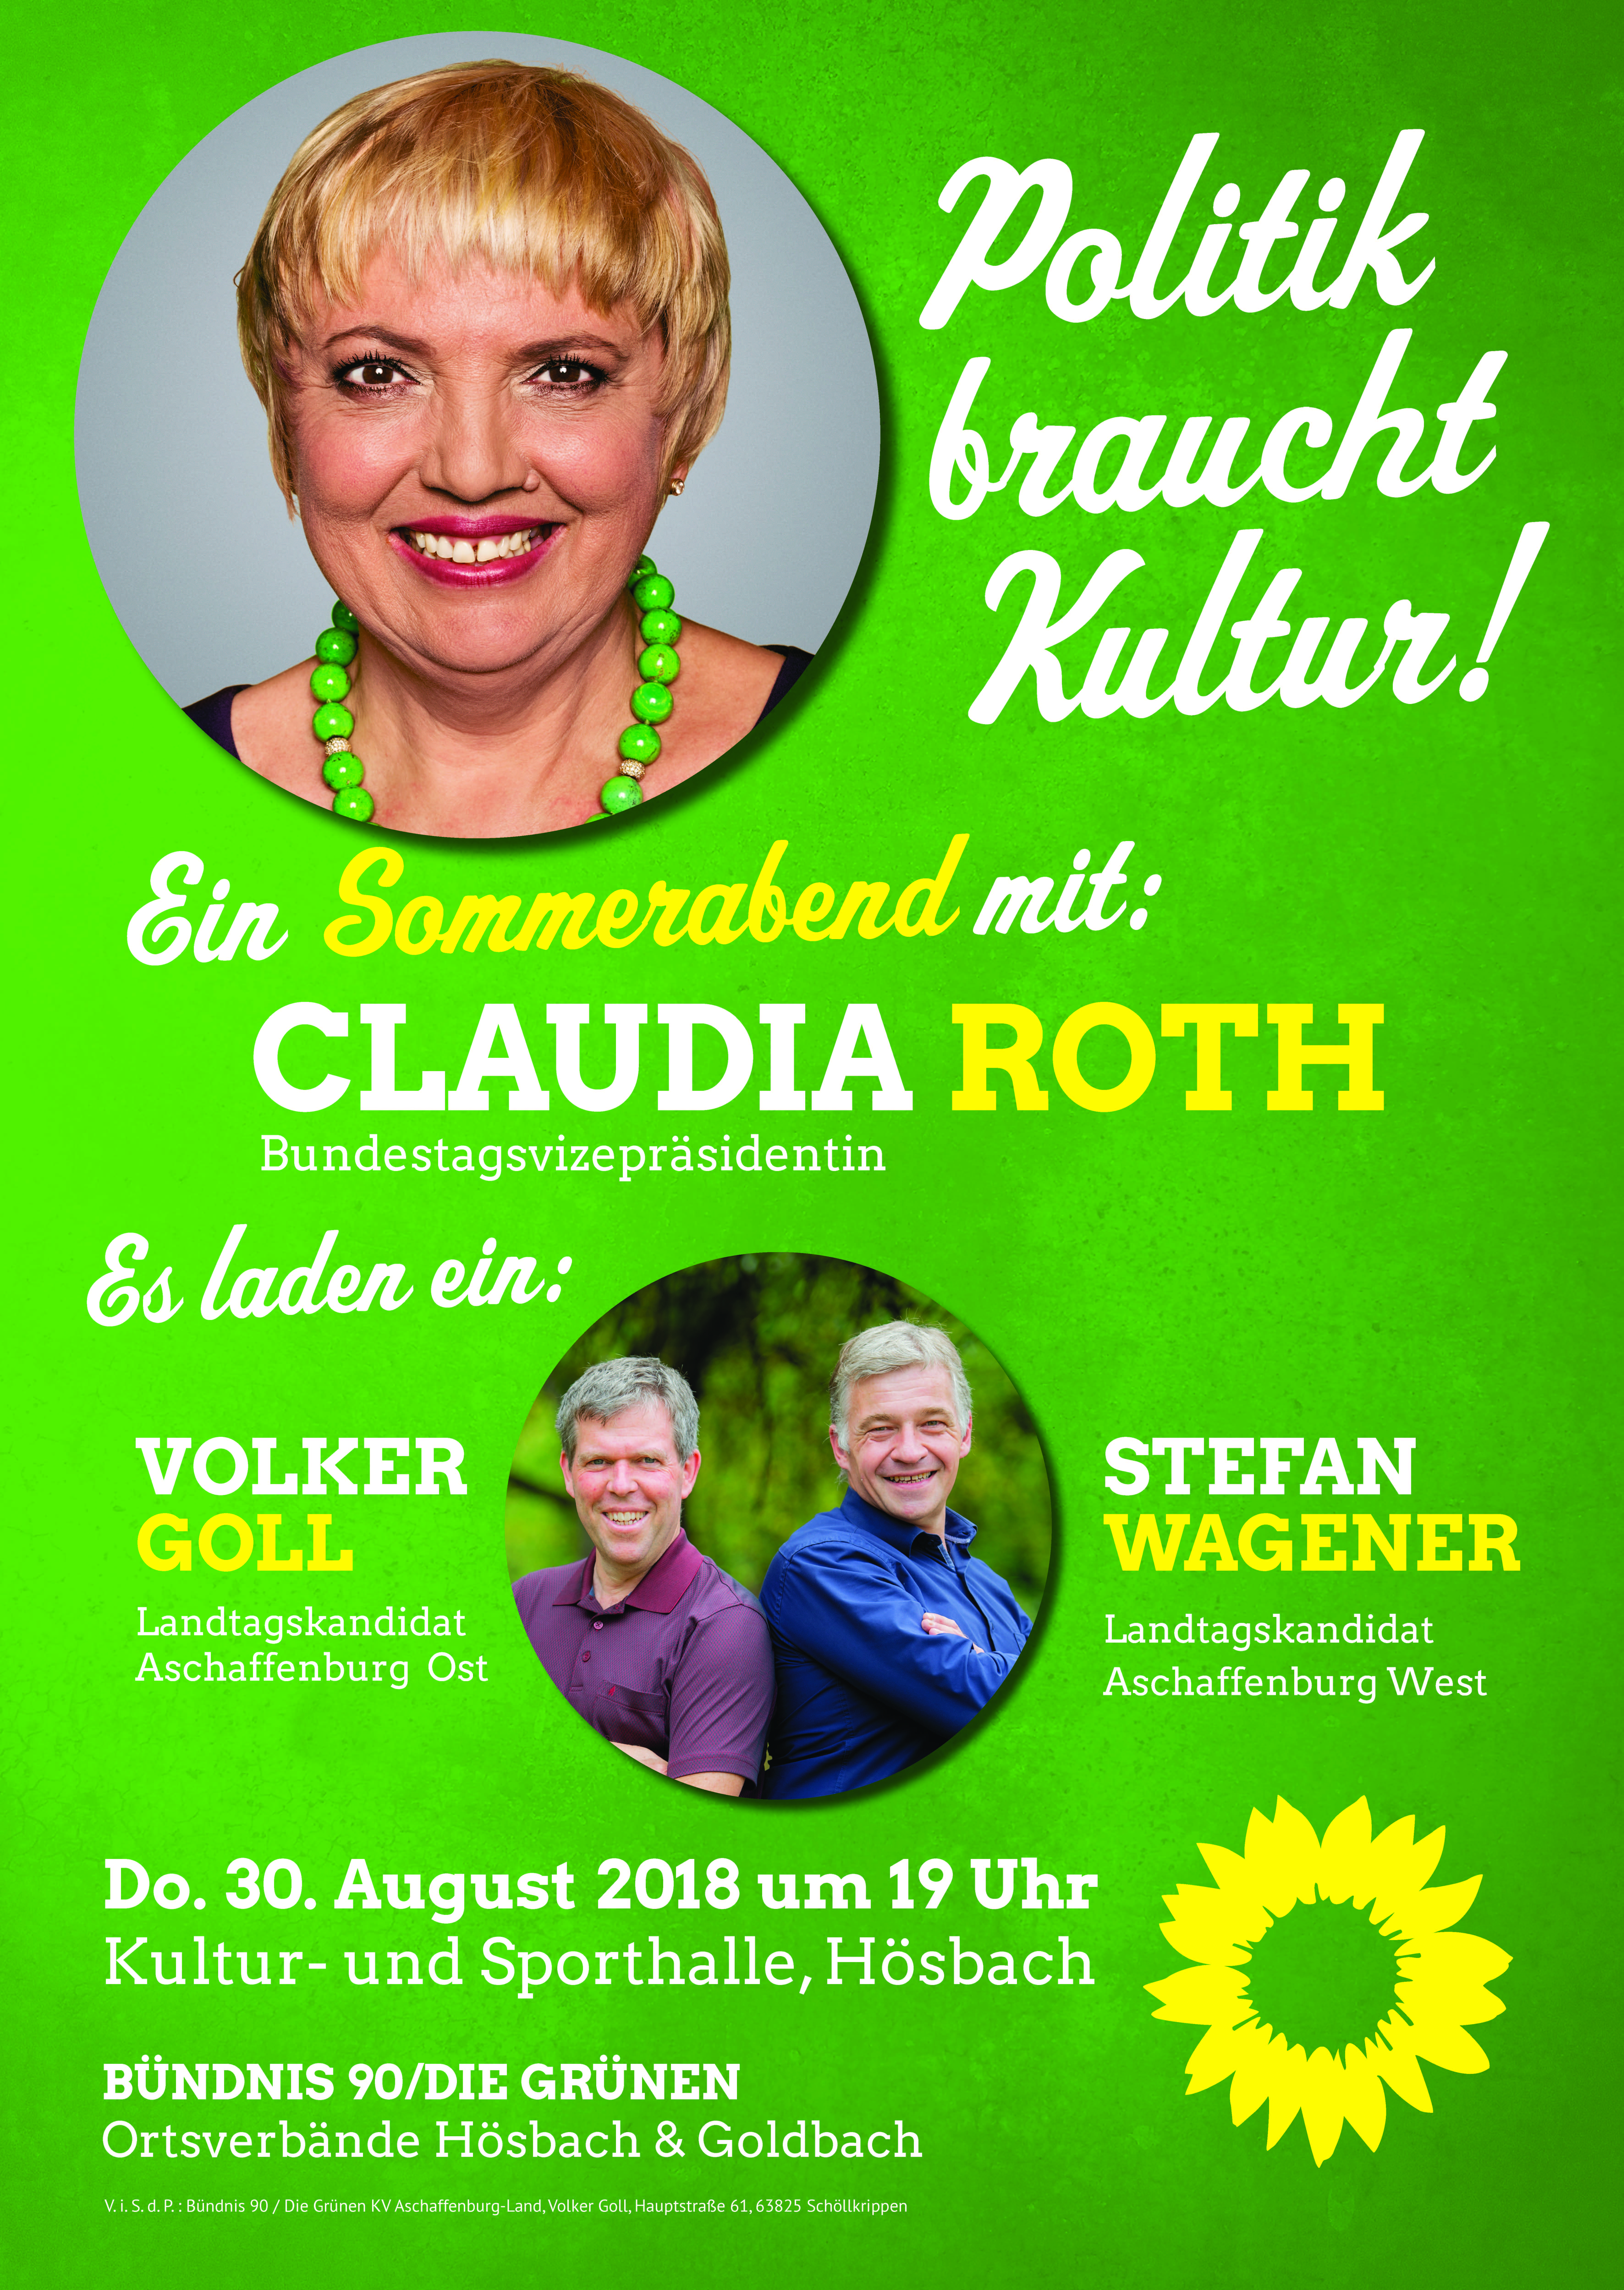 Claudia_Roth_AB_A1_Druck_3mm_Anschnitt